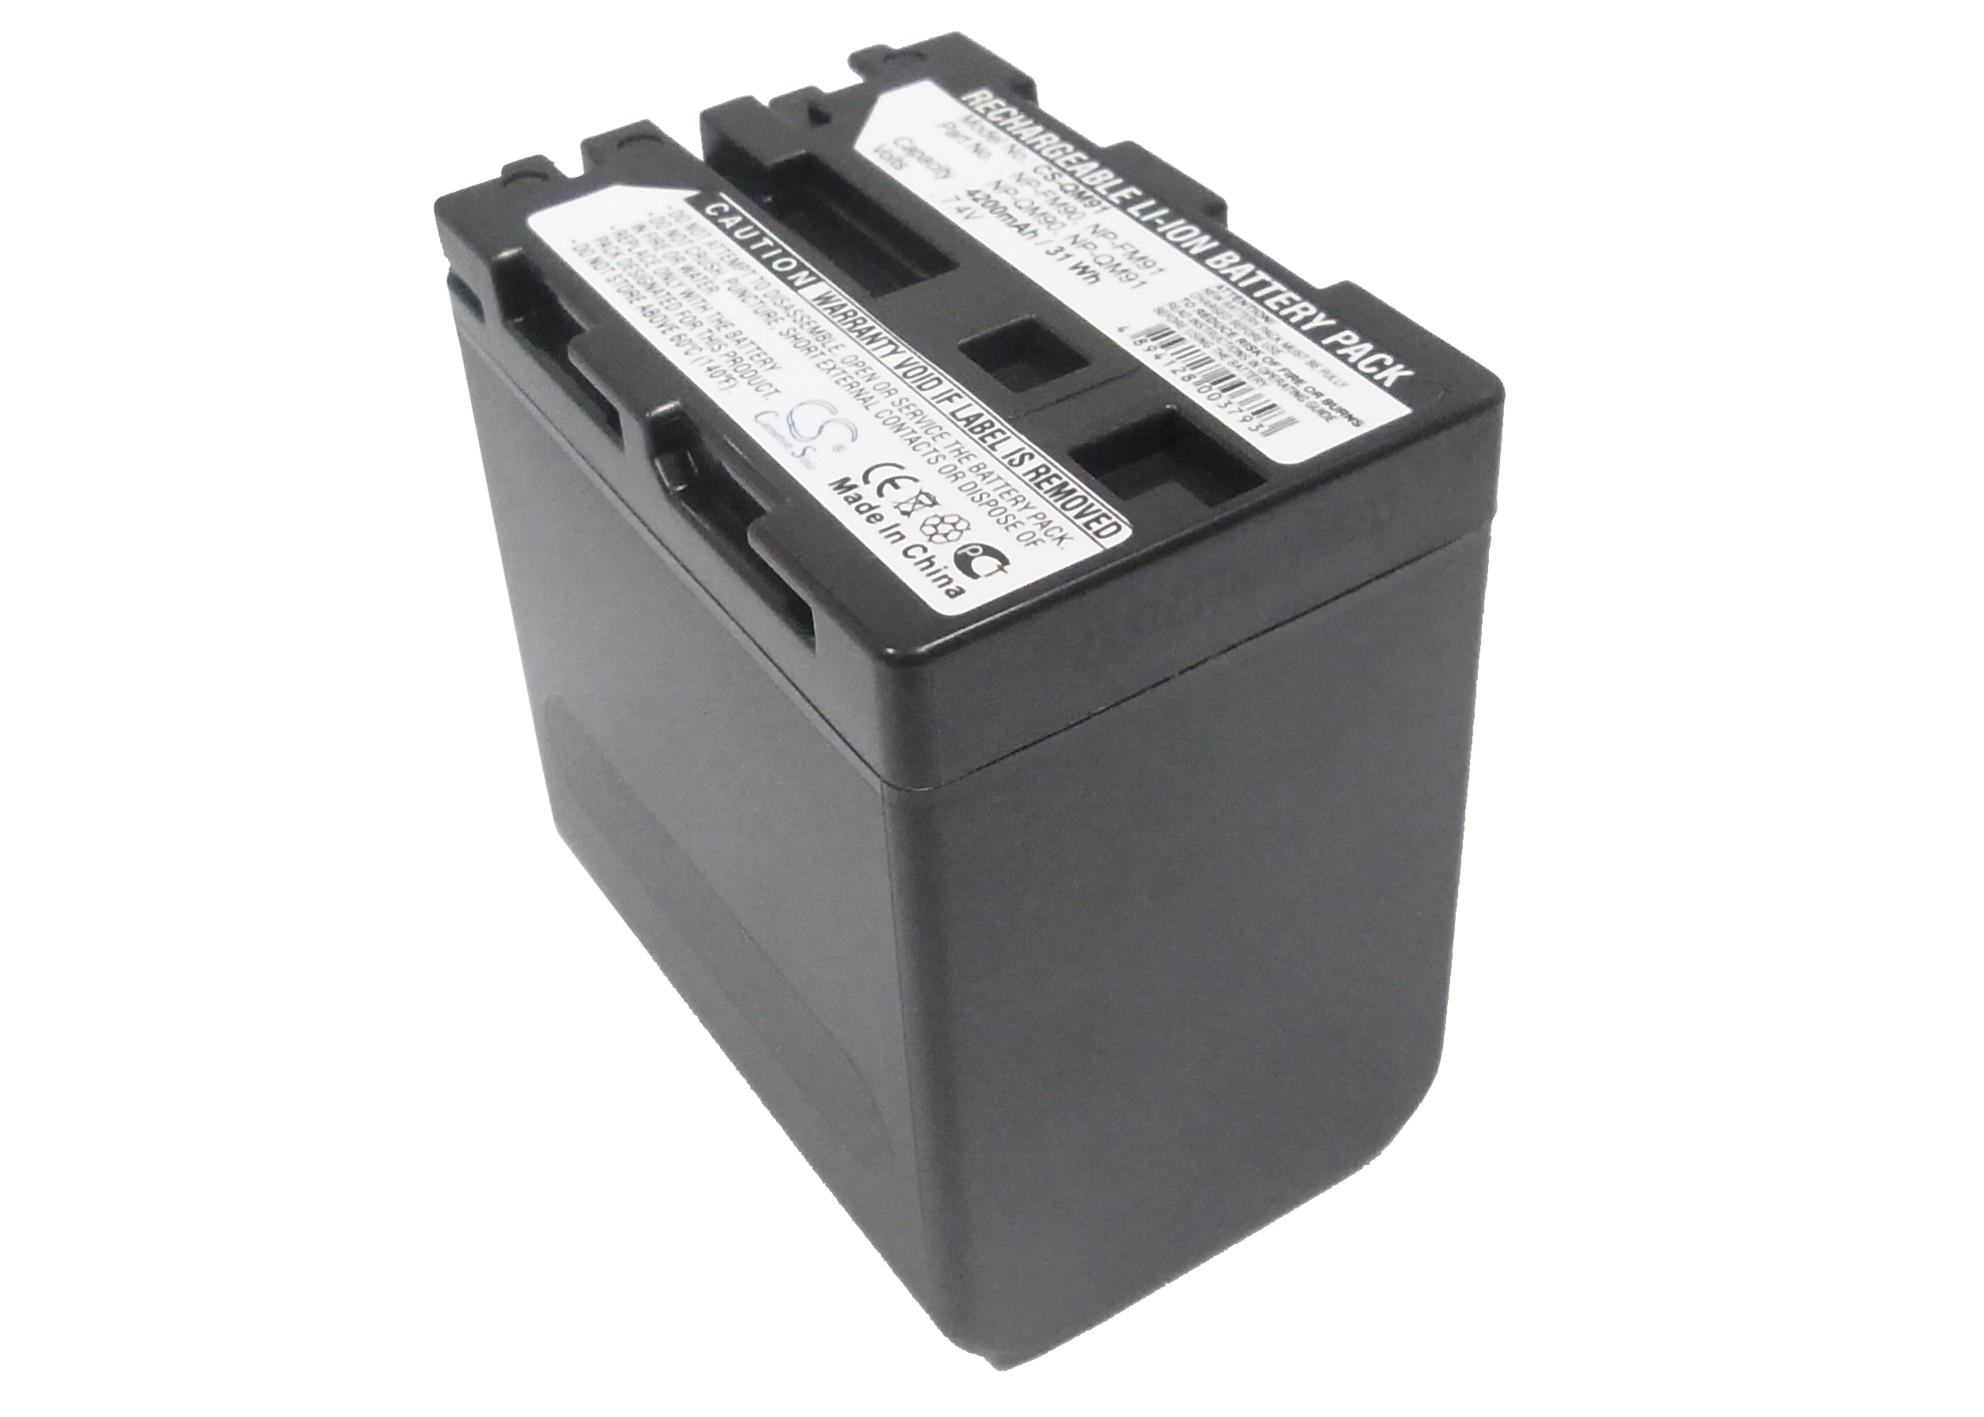 Cameron Sino baterie do kamer a fotoaparátů pro SONY DCR-TRV50 7.4V Li-ion 4200mAh tmavě šedá - neoriginální